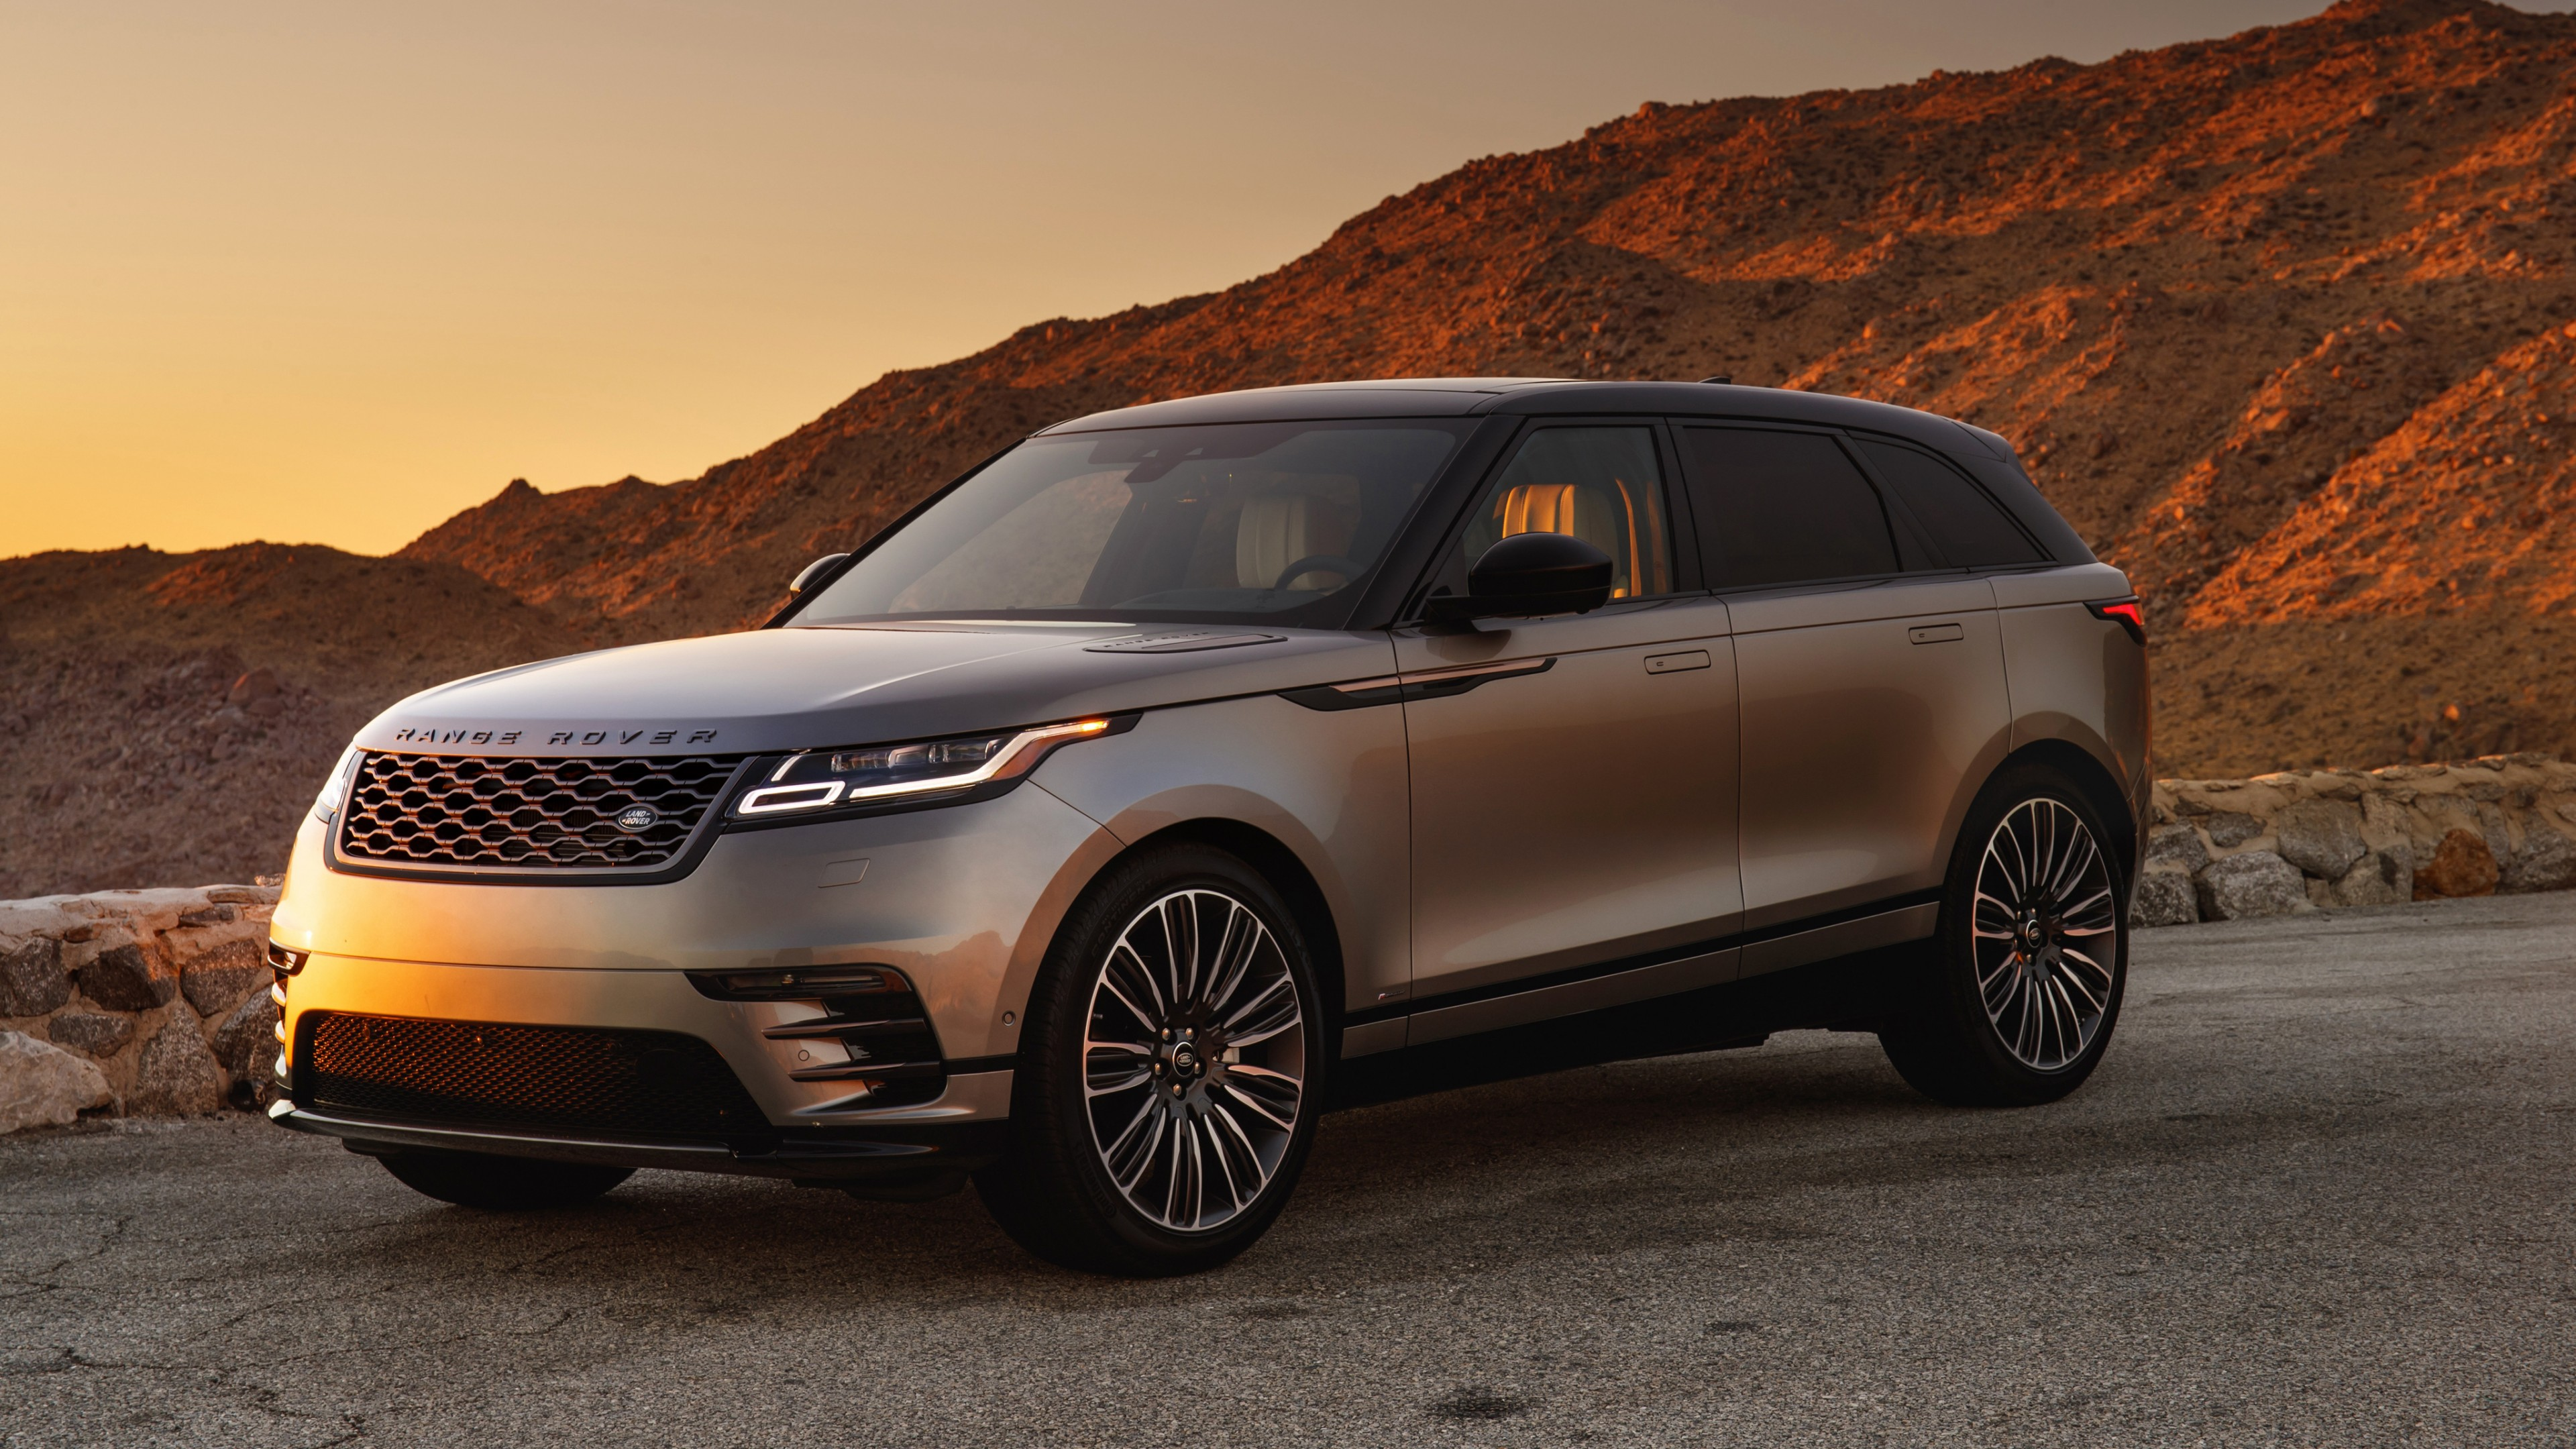 Land Rover Hse >> 2018 Range Rover Velar R Dynamic P380 HSE First Edition 4K ...